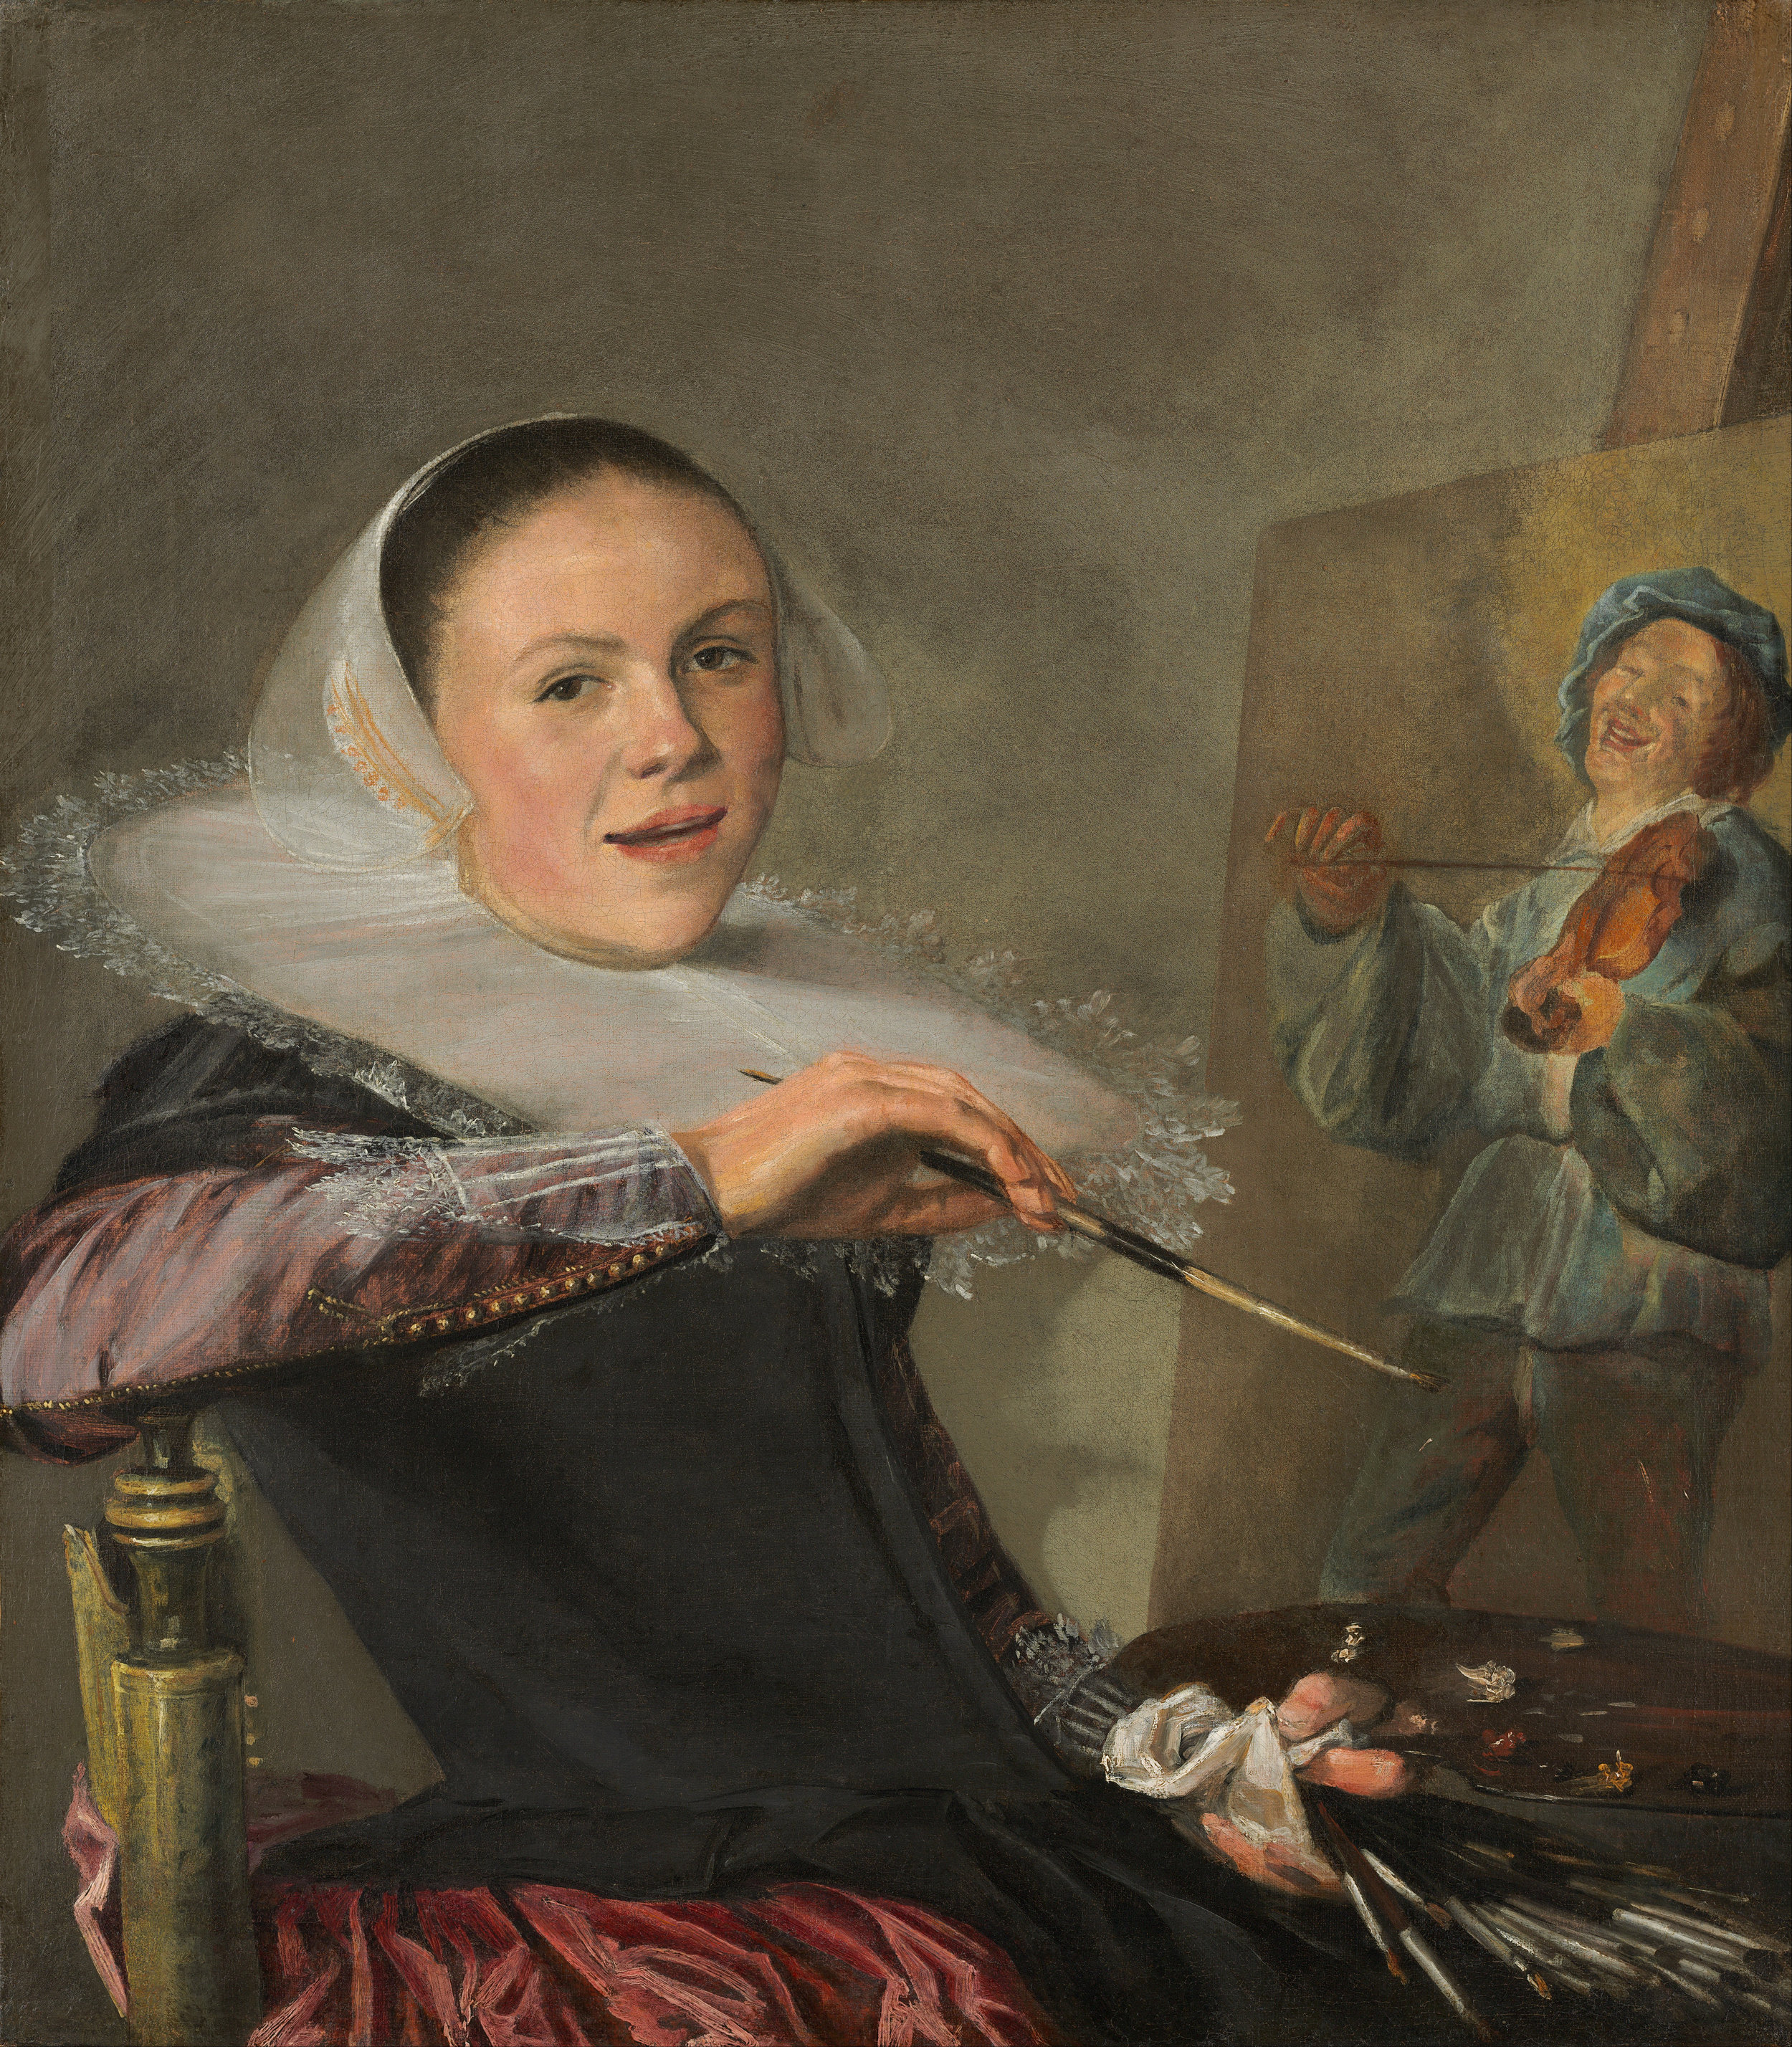 Judith Leyster, Self-Portrait, 1633